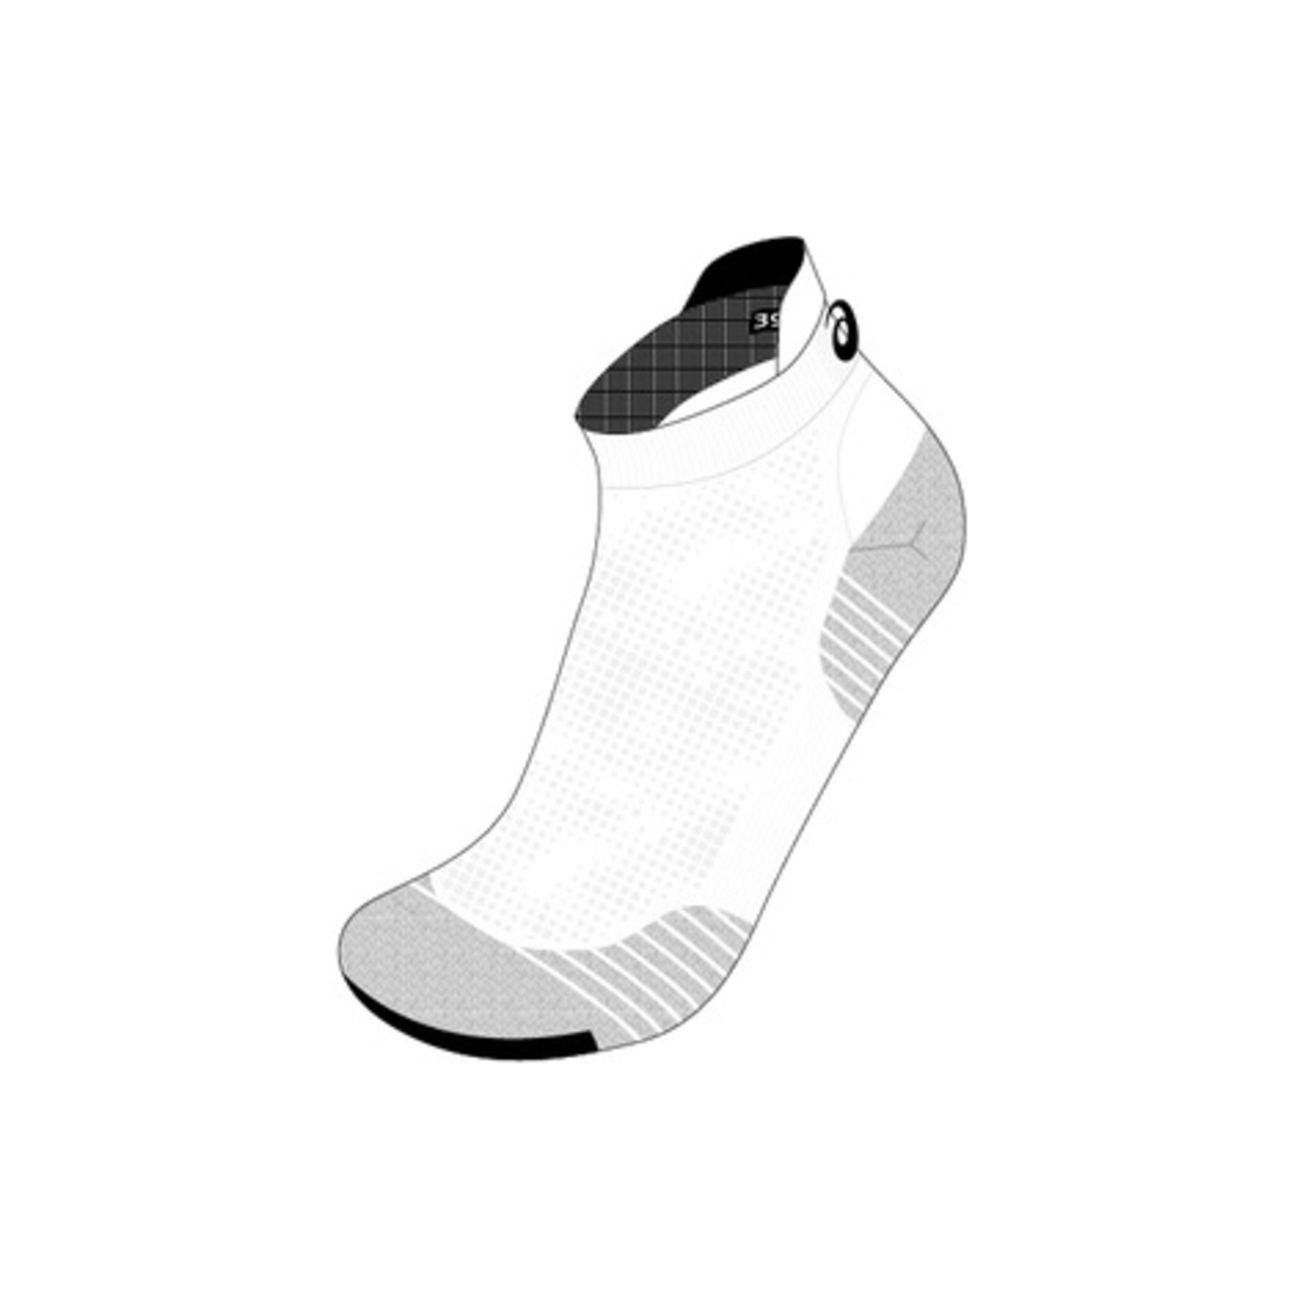 Course à pied adulte ASICS Chaussettes Asics Ultra Light Ankle